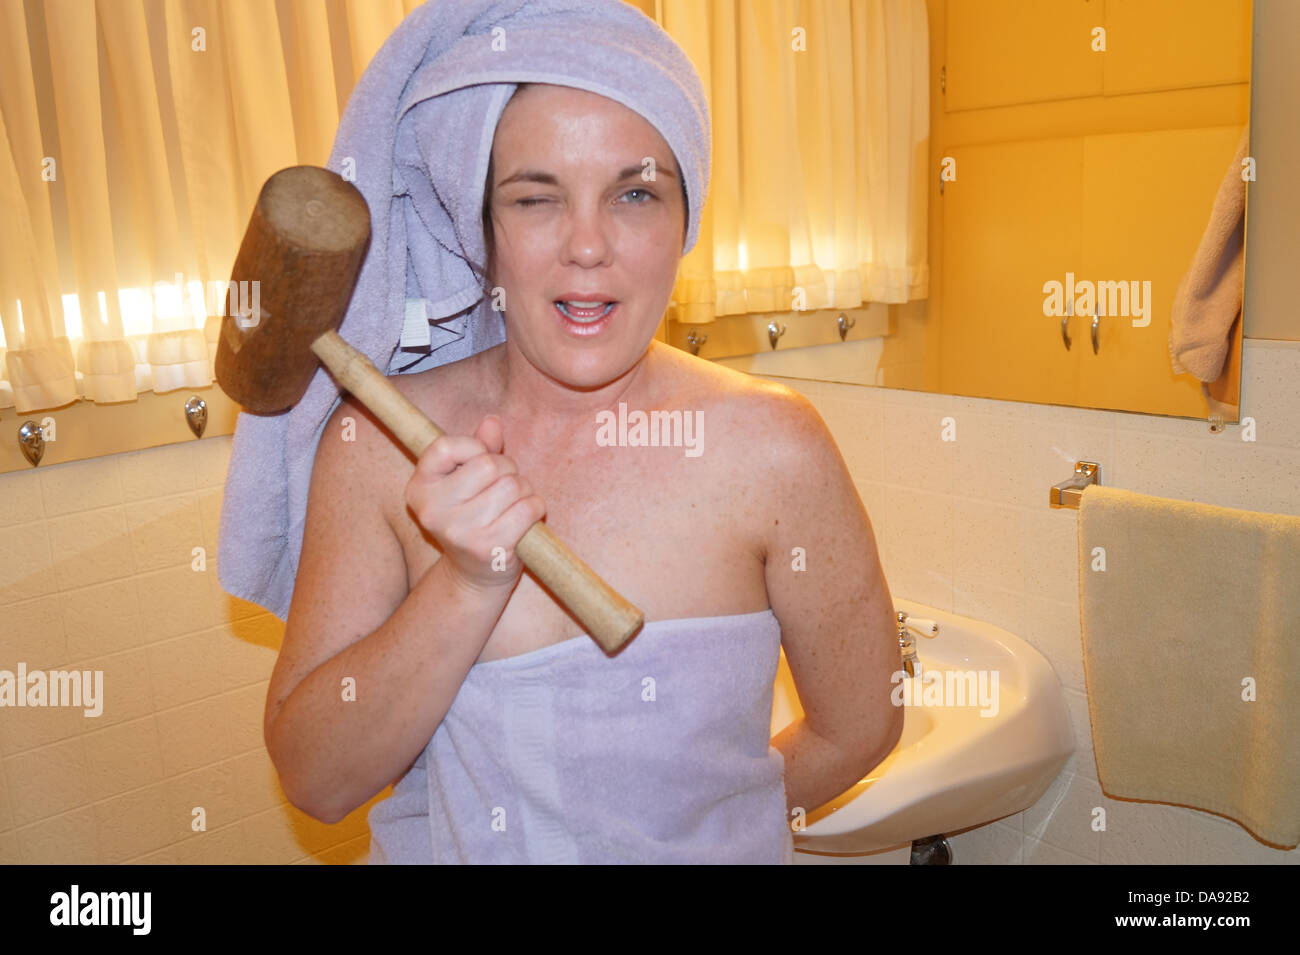 Sa salle de bains remodelage de femme. Photo Stock